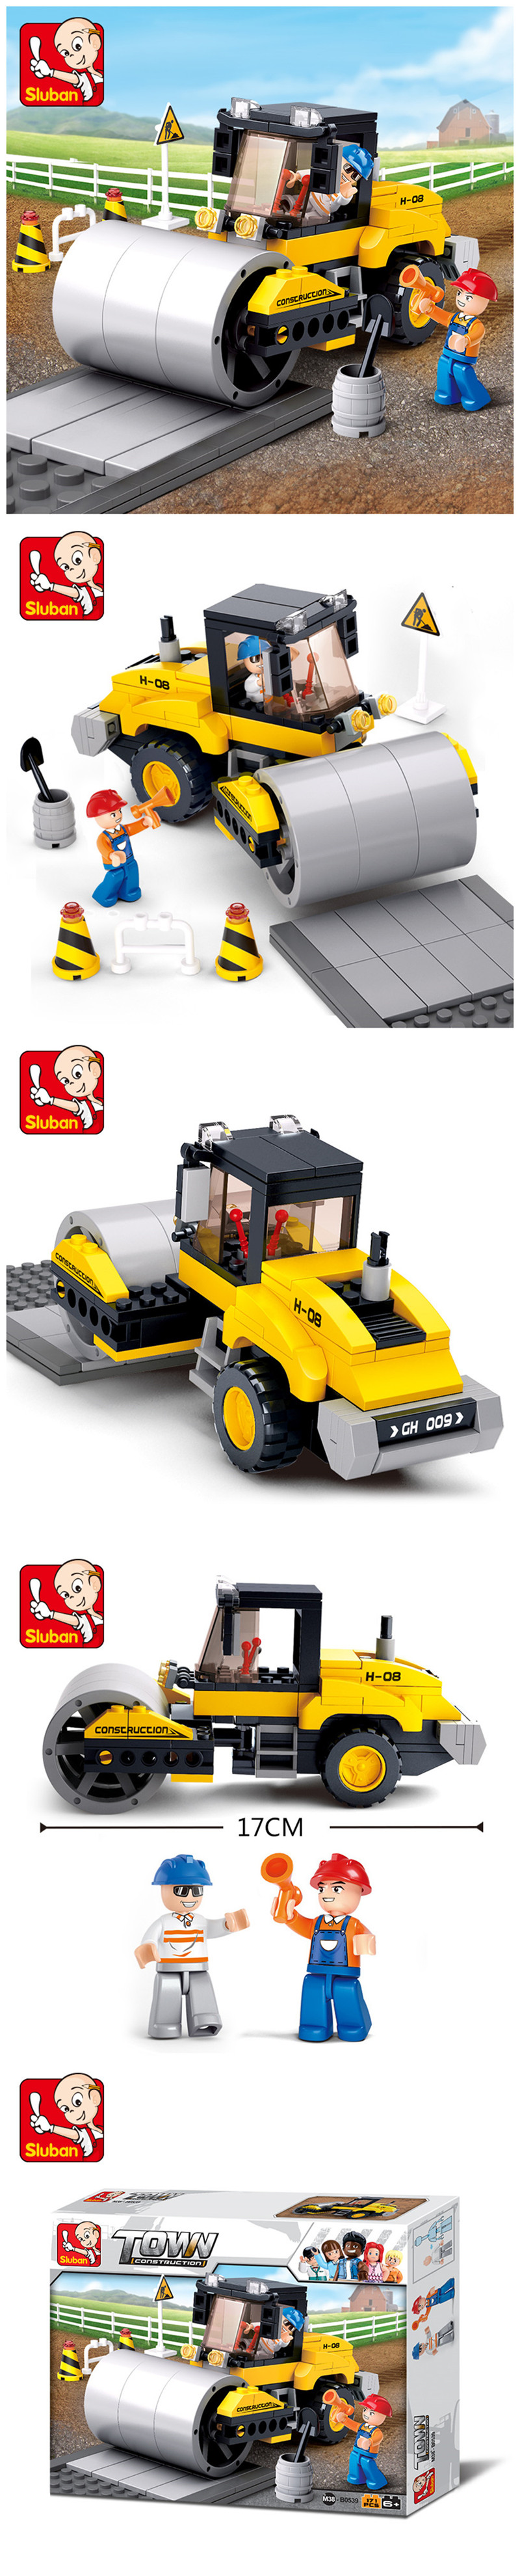 Sluban Building Blocks Educational Kids Toy Street Roller